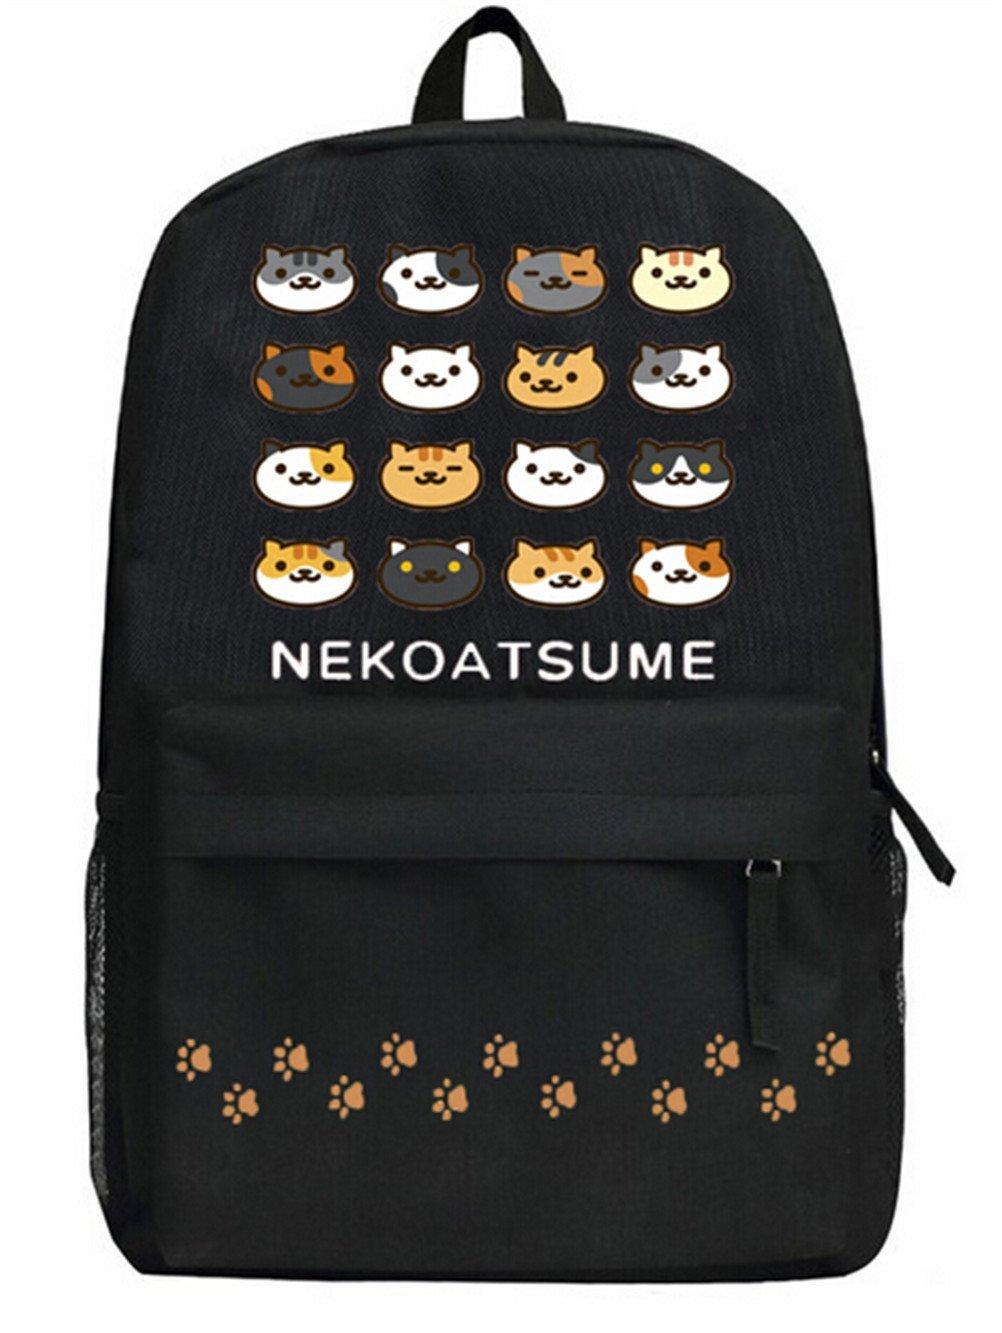 YOYOSHome ® Neko Atsumeアニメ猫裏庭コスプレDaypackバックパックスクールバッグ   B01FX8XD1G